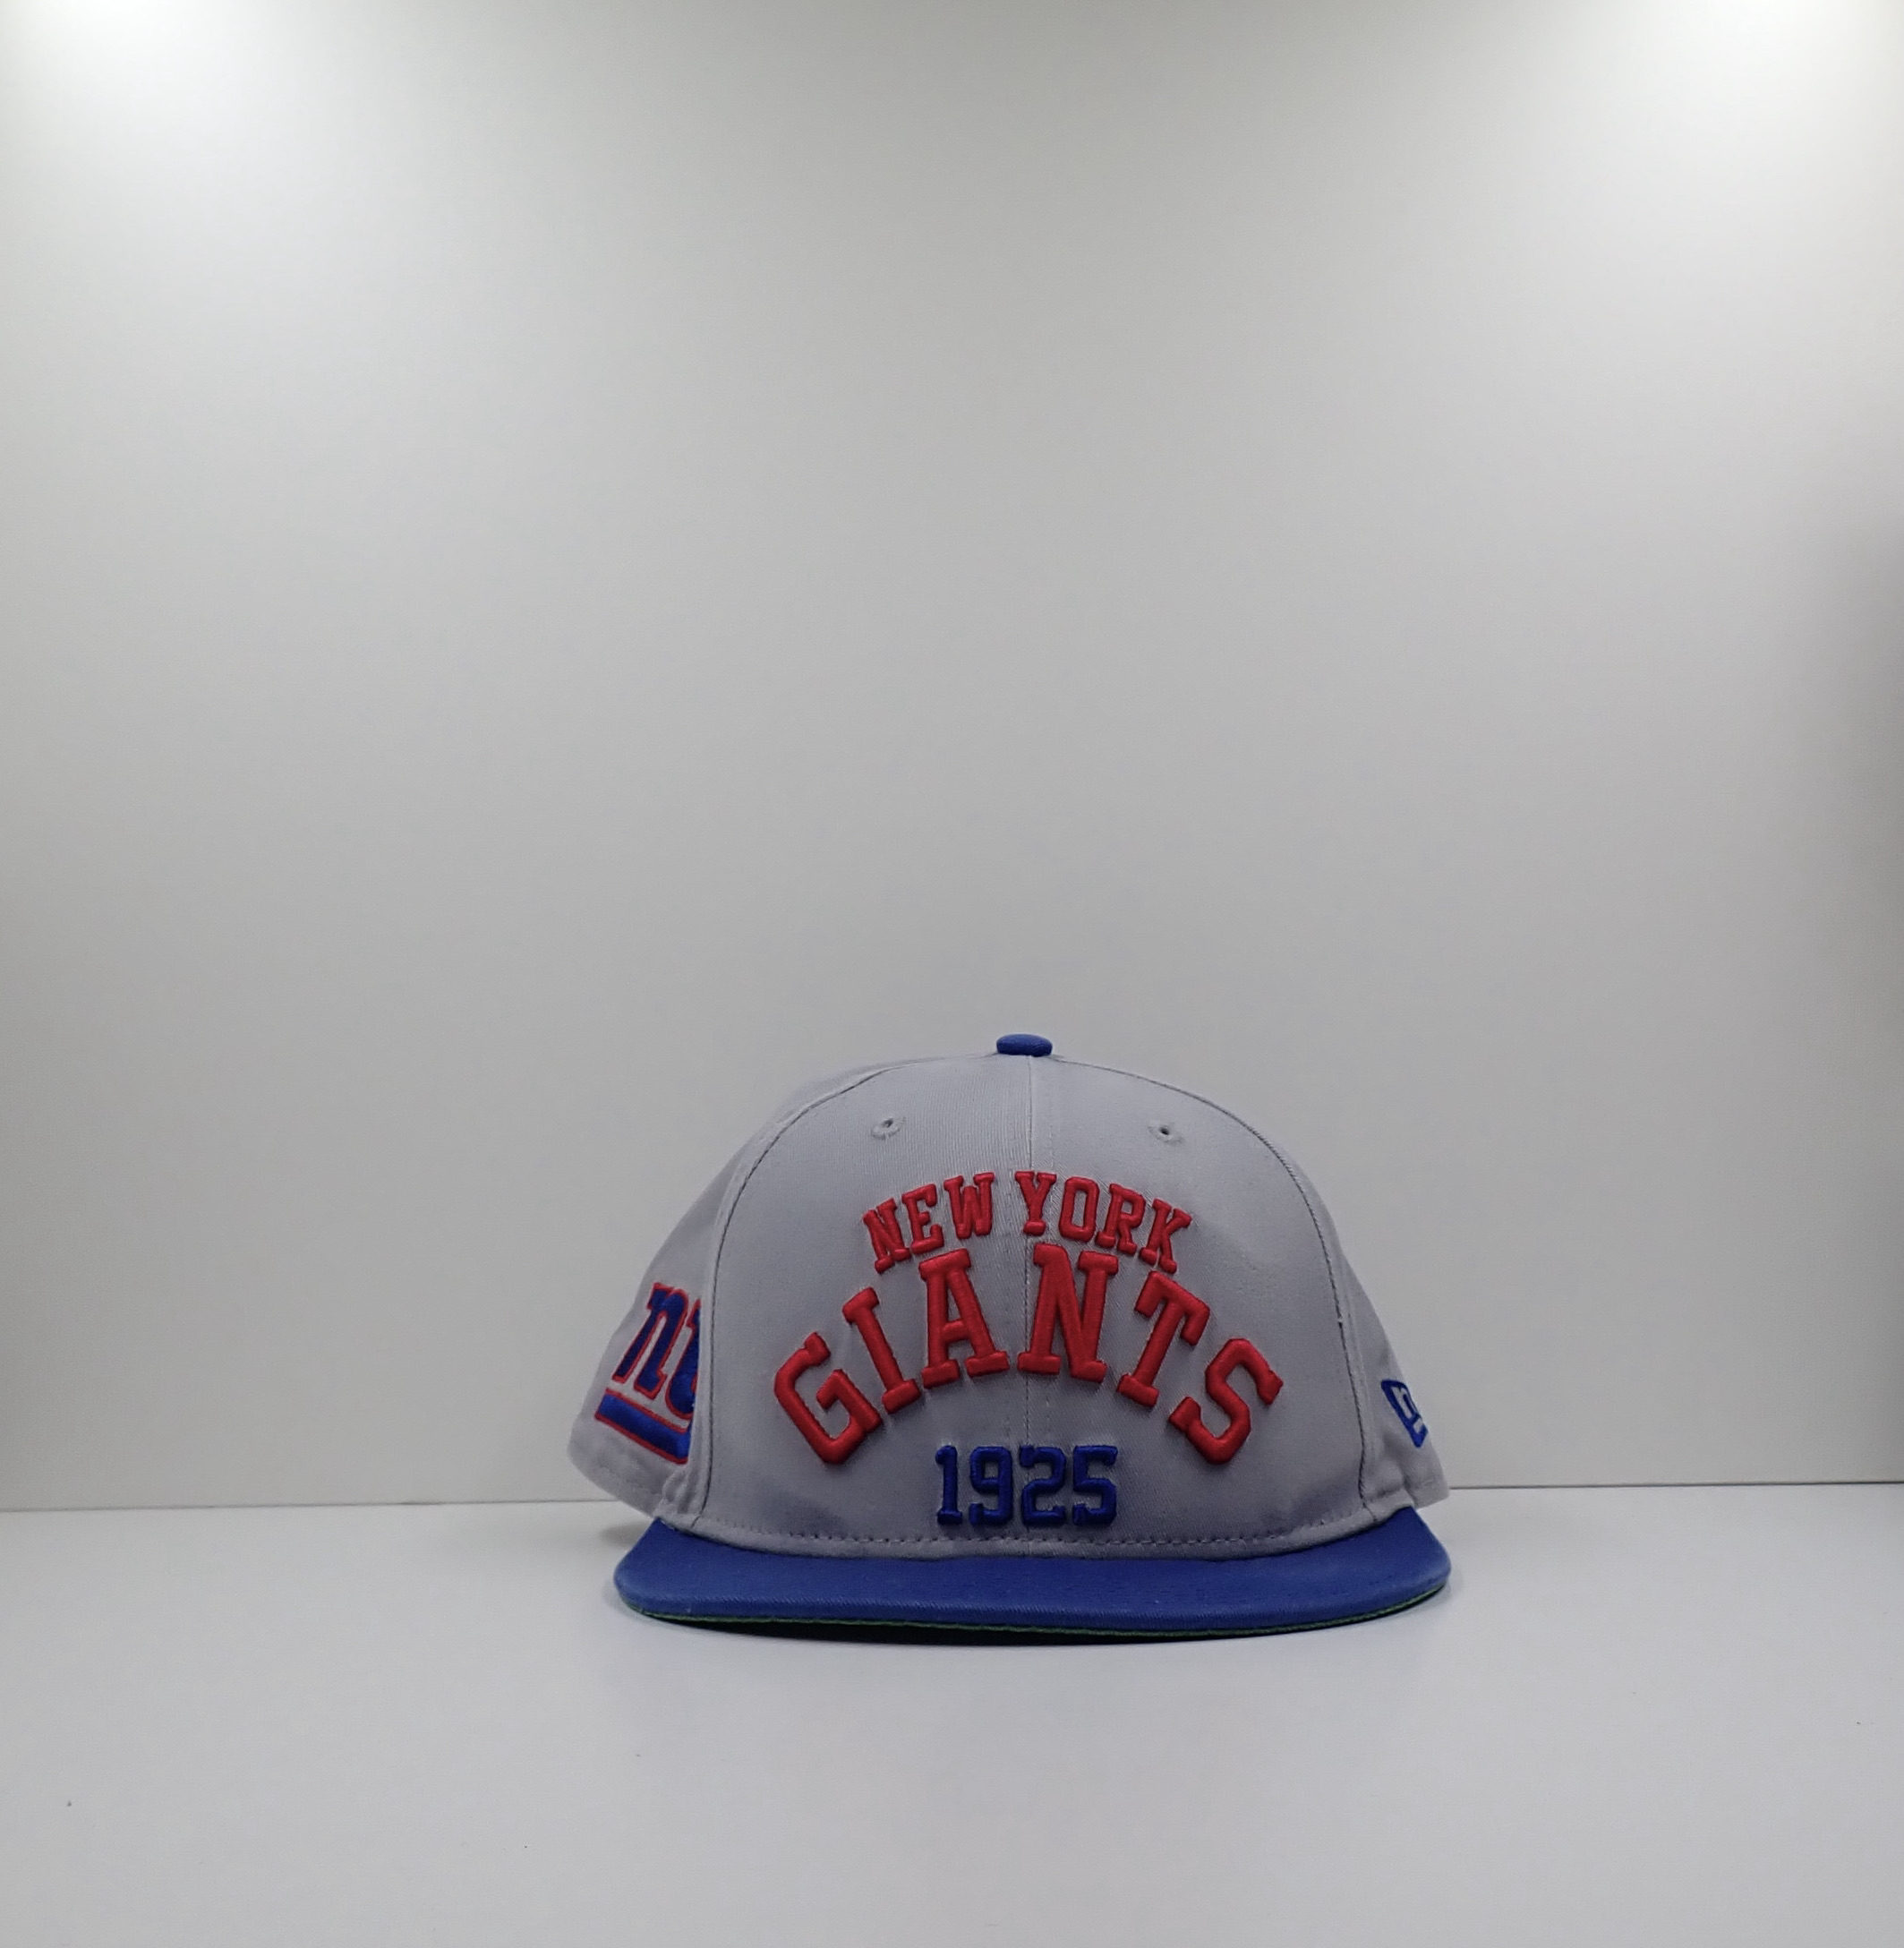 New York Giants New Era Cap